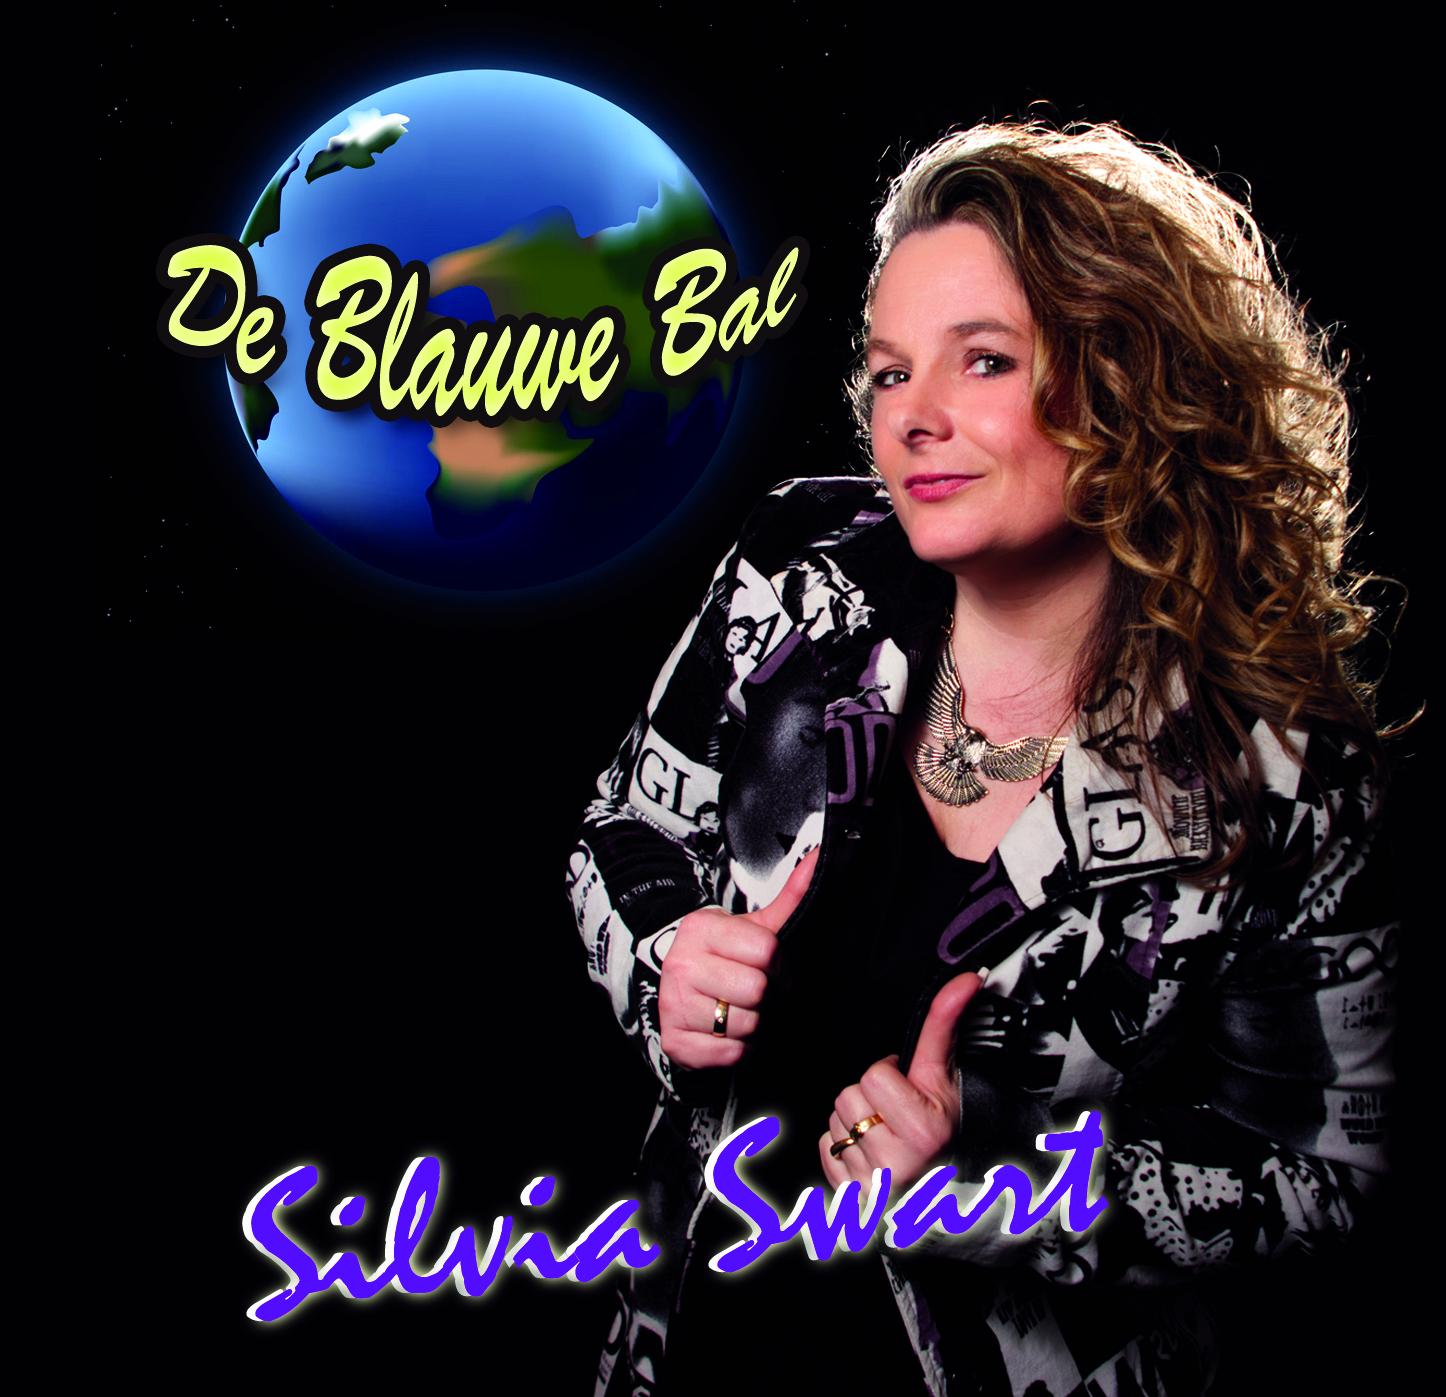 De Blauwe Bal - Silvia Swart